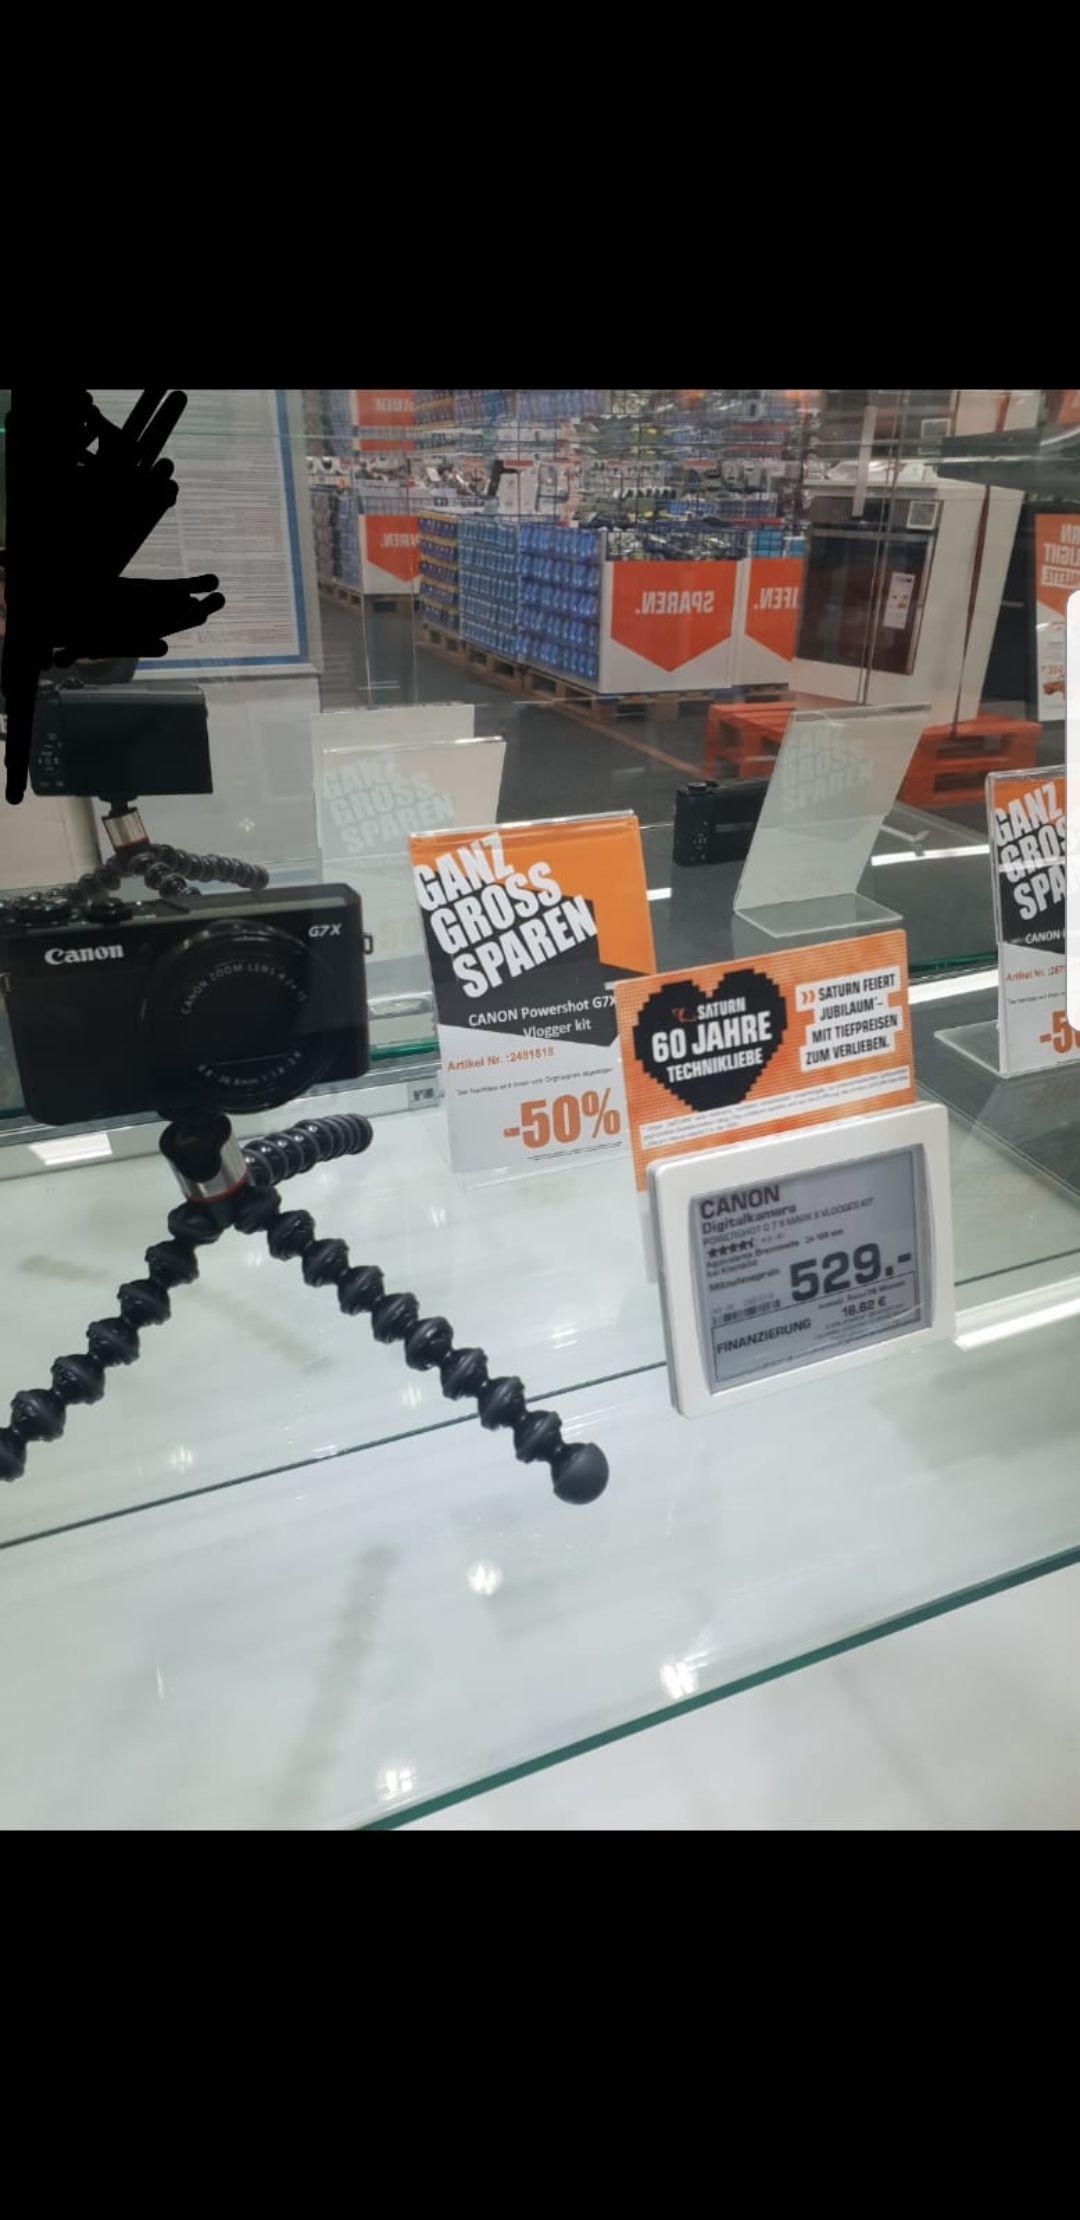 Canon PowerShot G7 X Mark II [sammeldeal ausstellungsstücke] [Saturn Bremen Lokal]